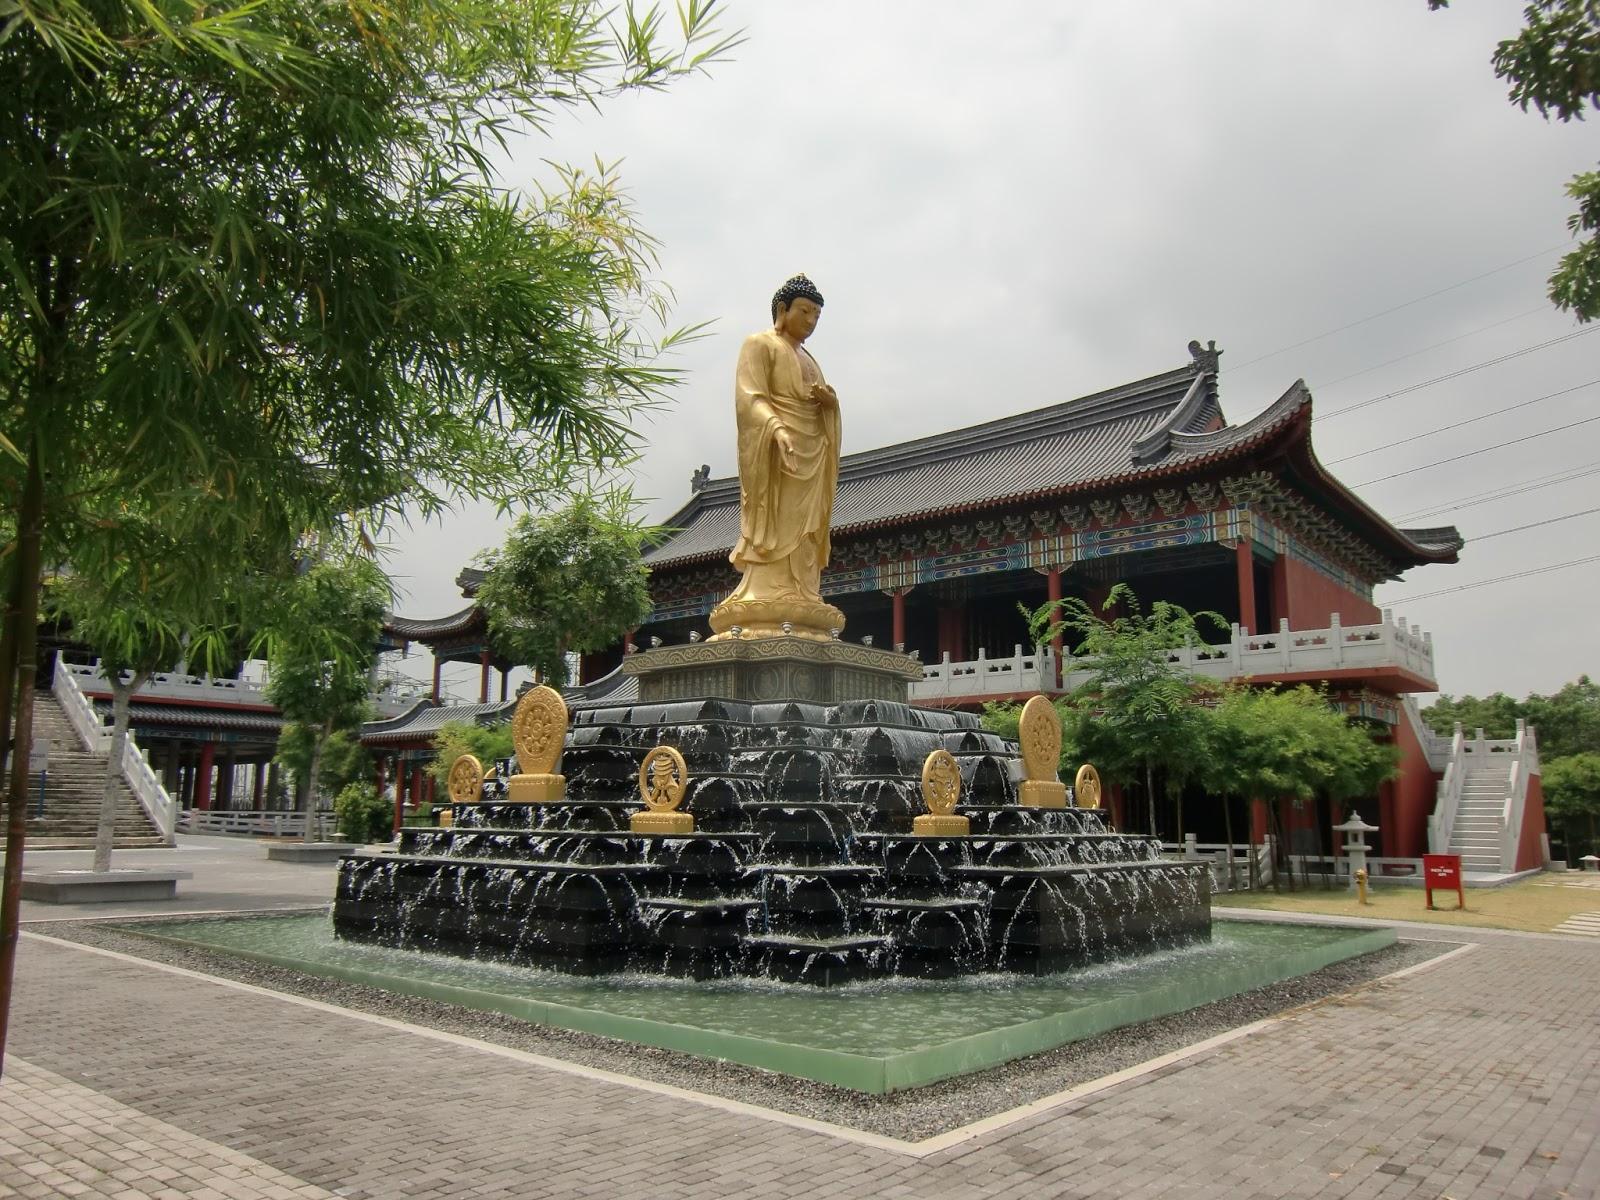 shah alam buddhist singles Buddhist links of selangor darul ehsan maha karuna buddhist society - shah alam no 17-1, 17-2 jalan bulan fu 5/f, bandar pinggiran subang, 40150 shah alam.